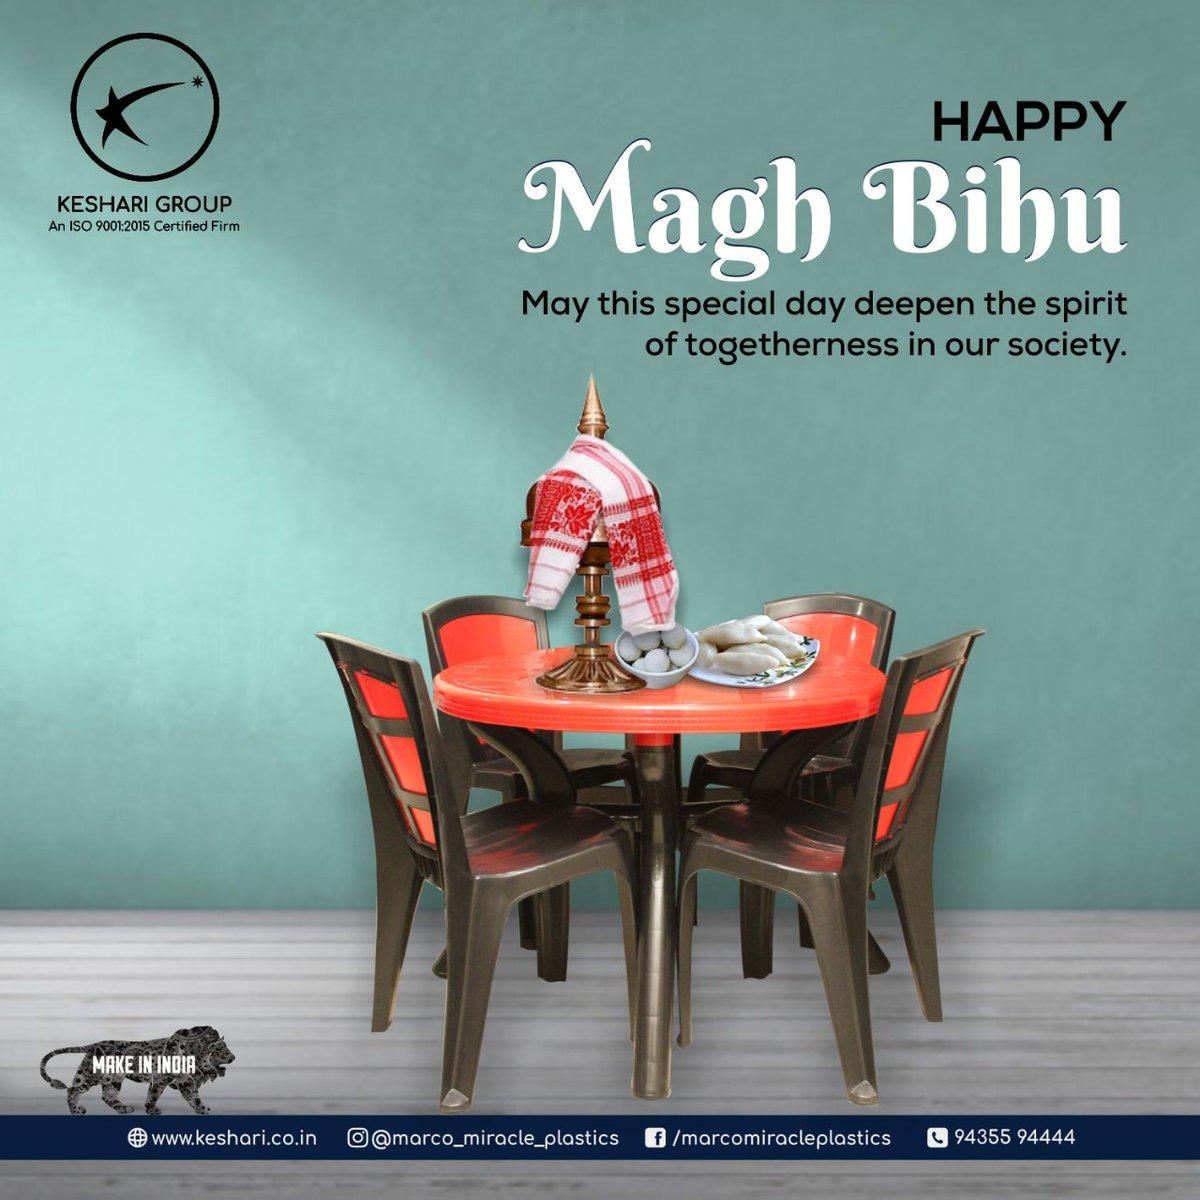 May this Bhogali Bihu be a harbinger of happiness in your life! Happy Bihu. . . . #Bihu #HappyMaghBihu #Chair #Table #DinningTable #Bucket #Dustbin #Stool #HouselholdItems #HouselholdEssentials #MarcoMiracle #Miracle #Marco #MiracleChairs #KeshariIndustries #Guwahati #Assam